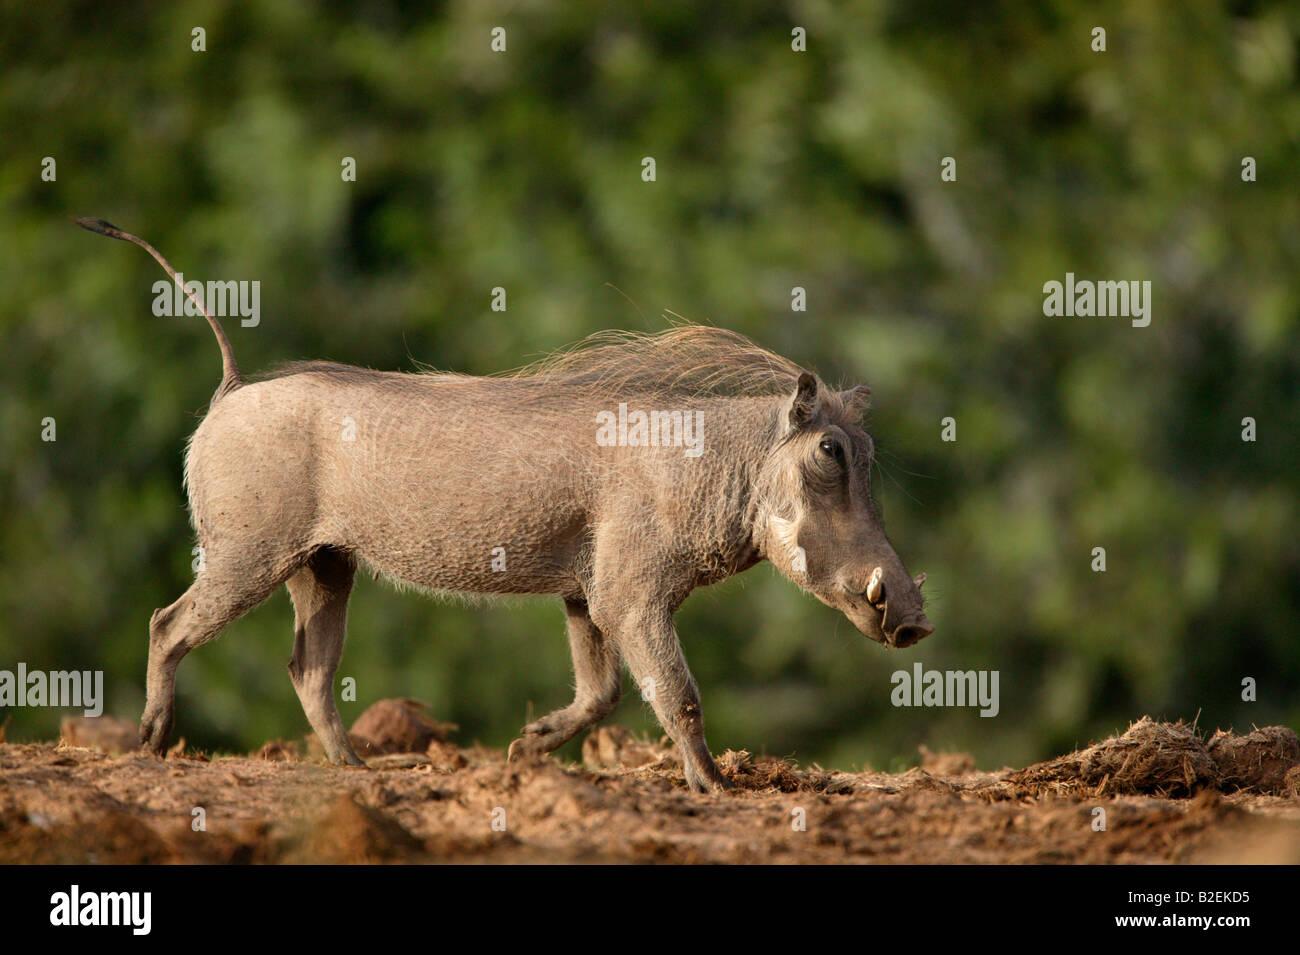 Warthog trote con rabo erguido Imagen De Stock